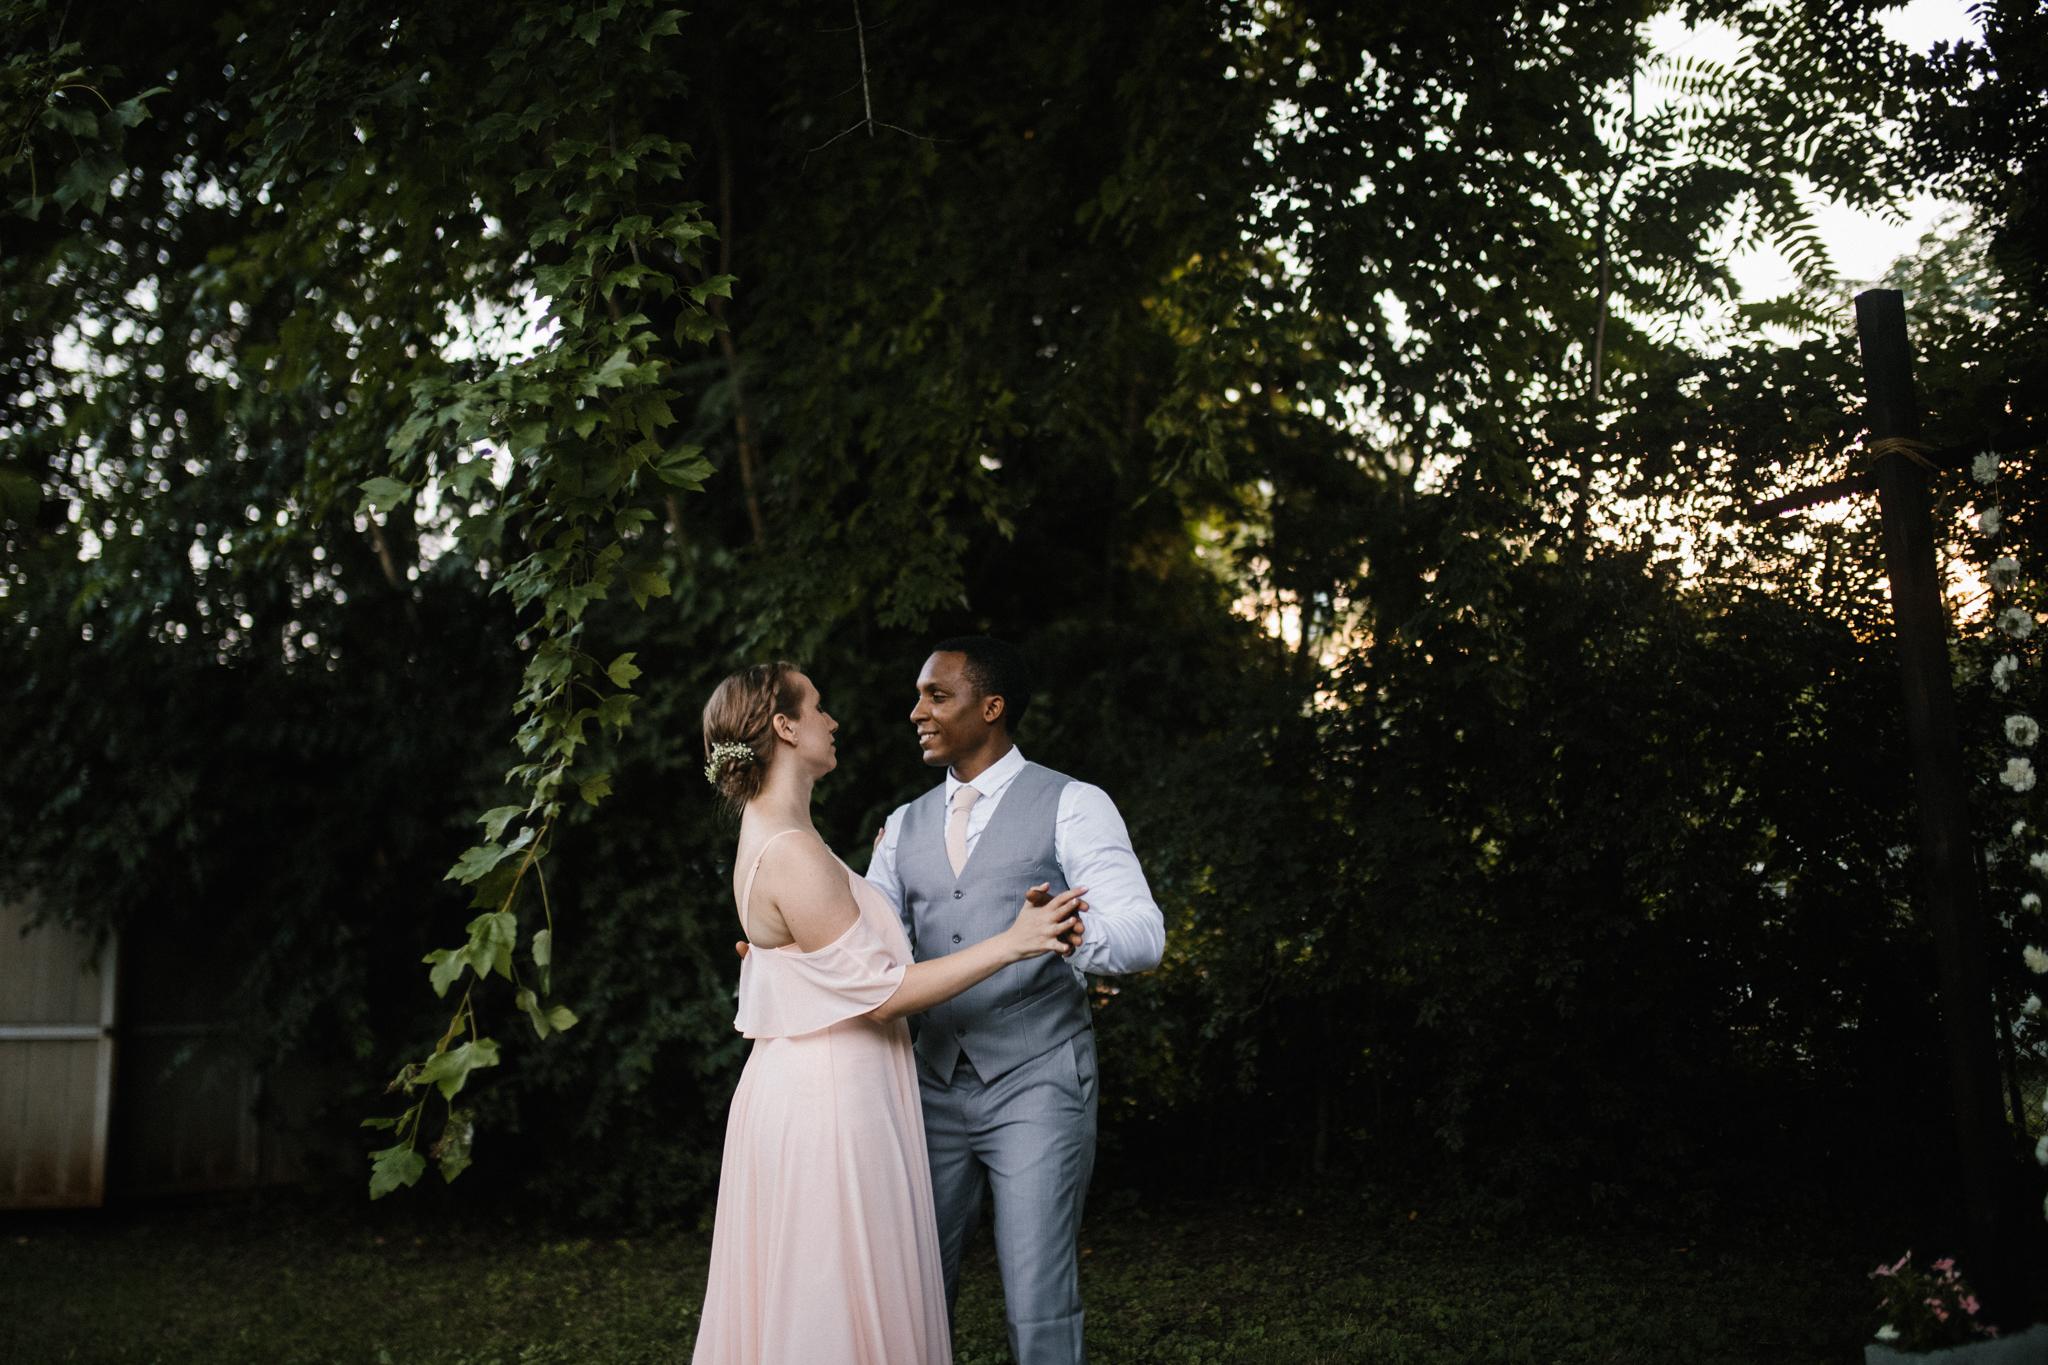 dorota_dwight_richmond_backyard_wedding-94.jpg